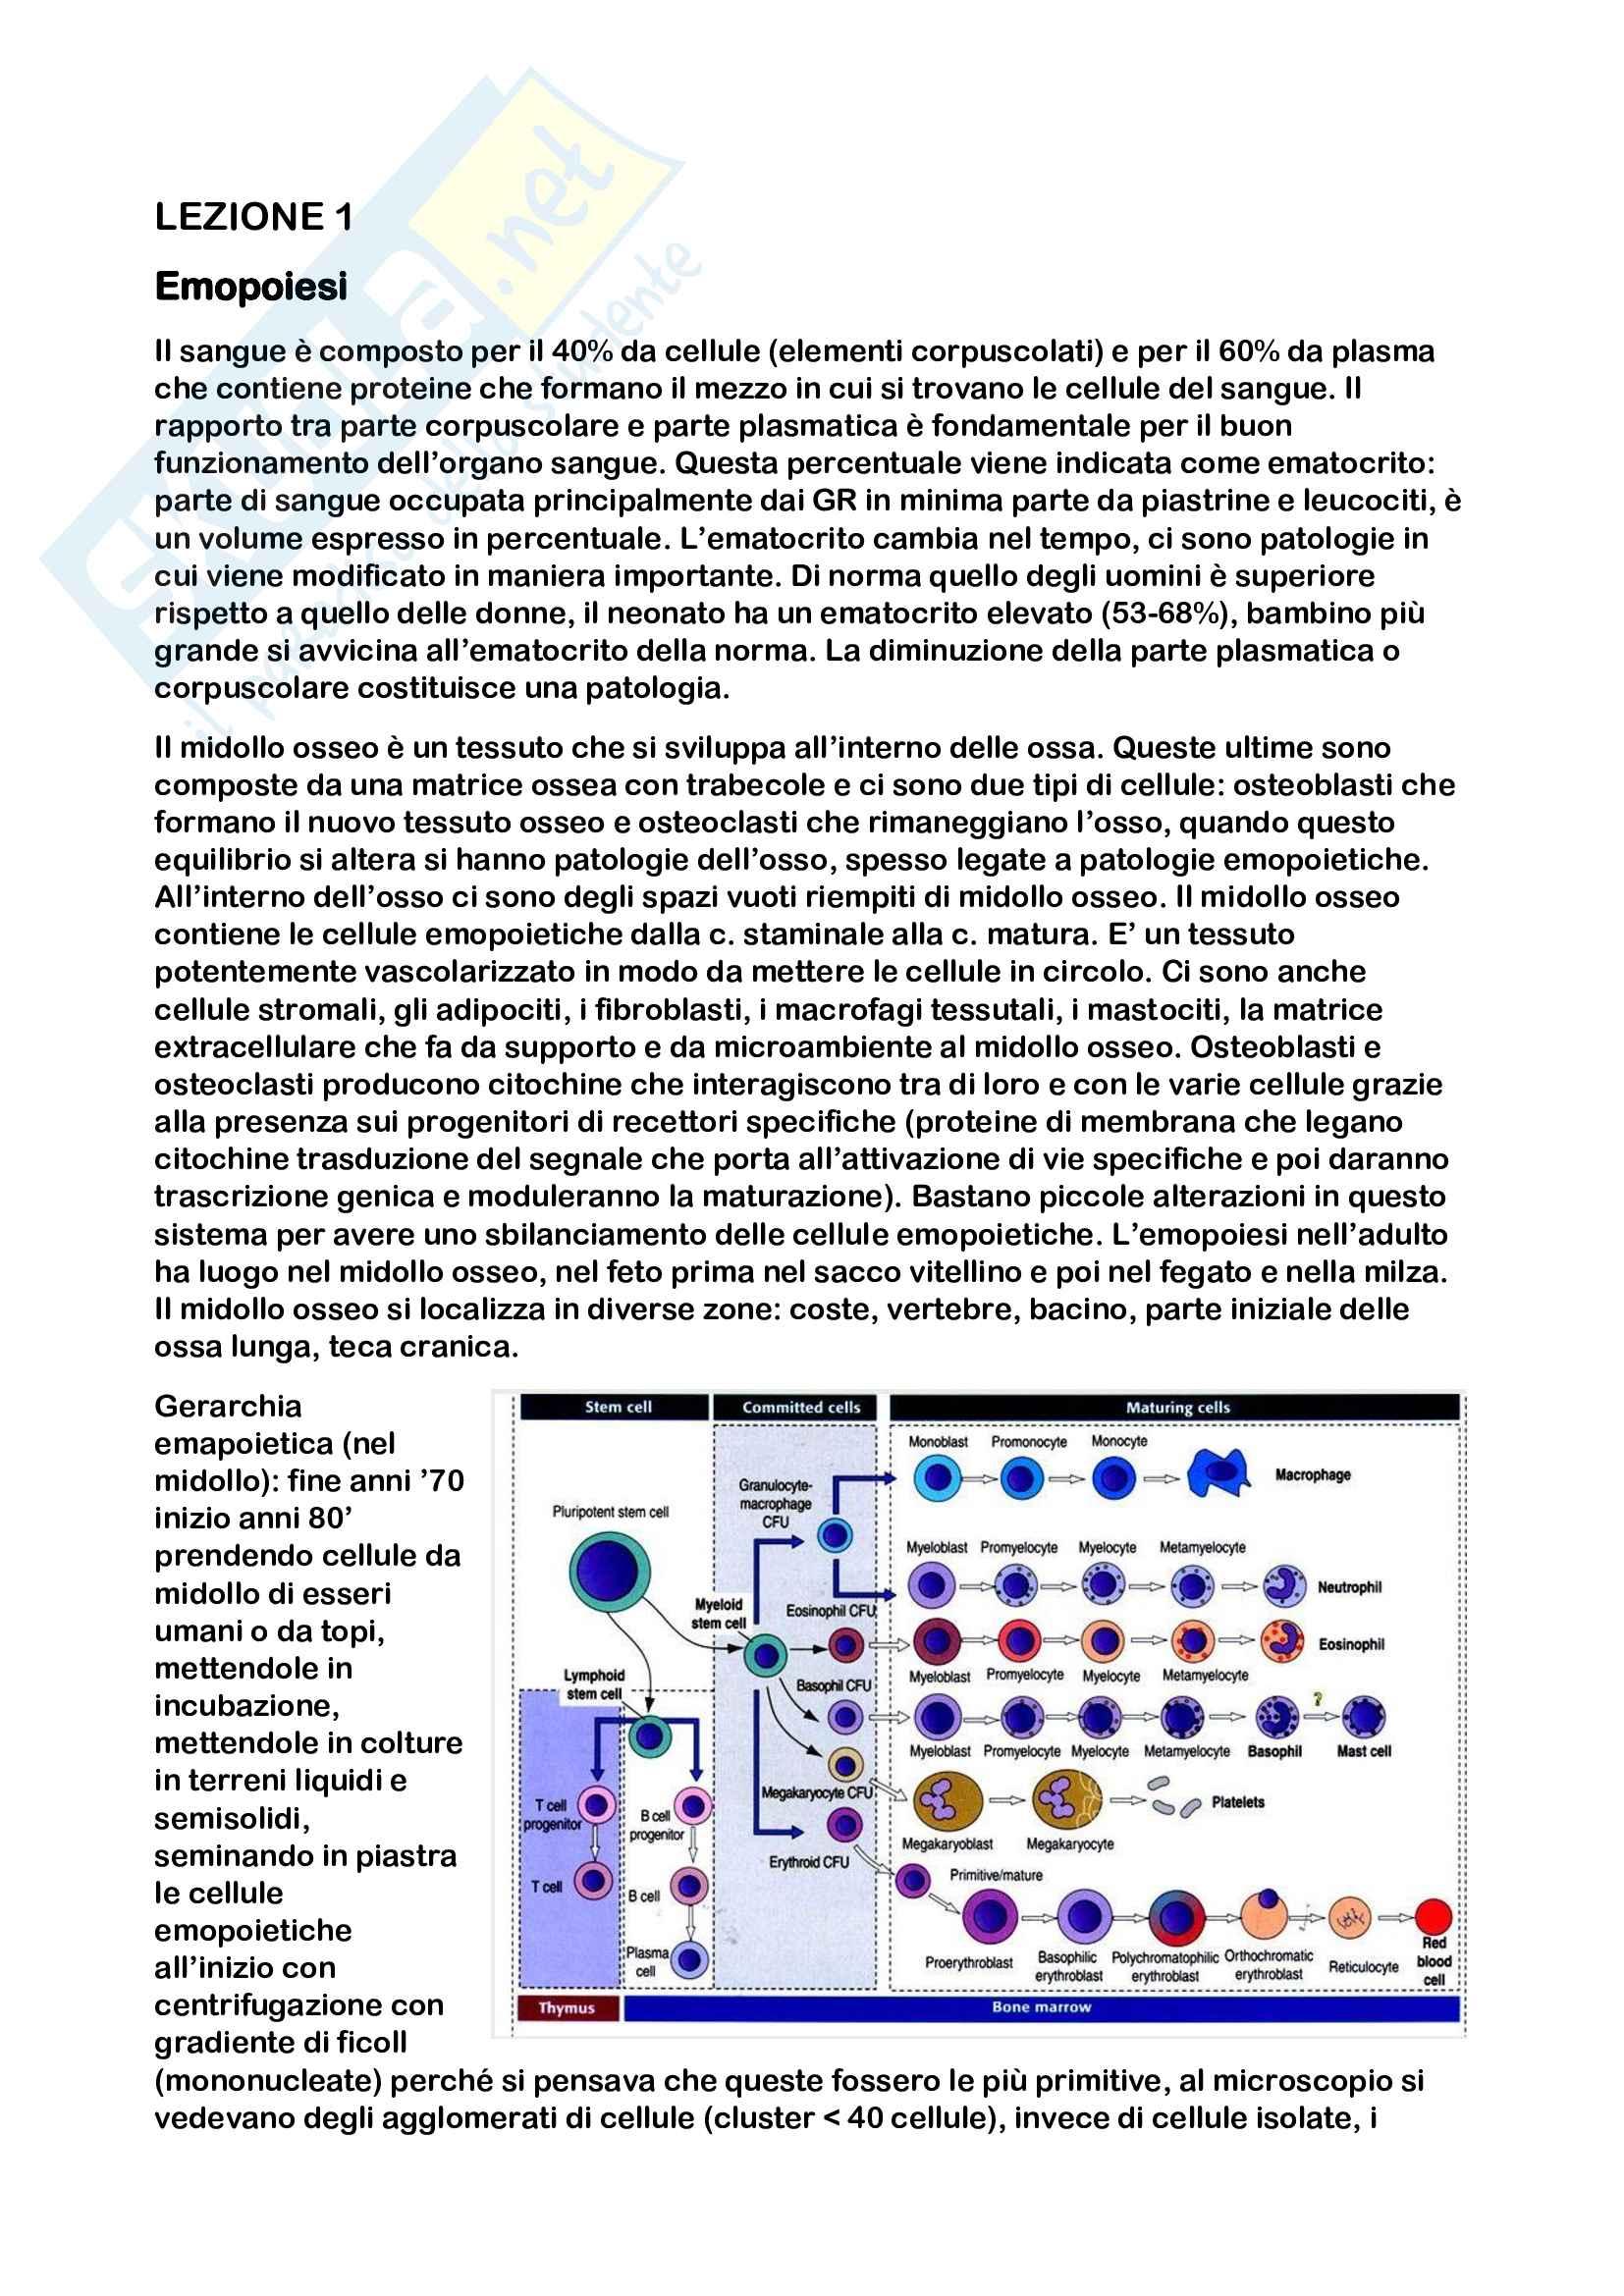 Lezioni di immunoematologia prof.ssa Santini